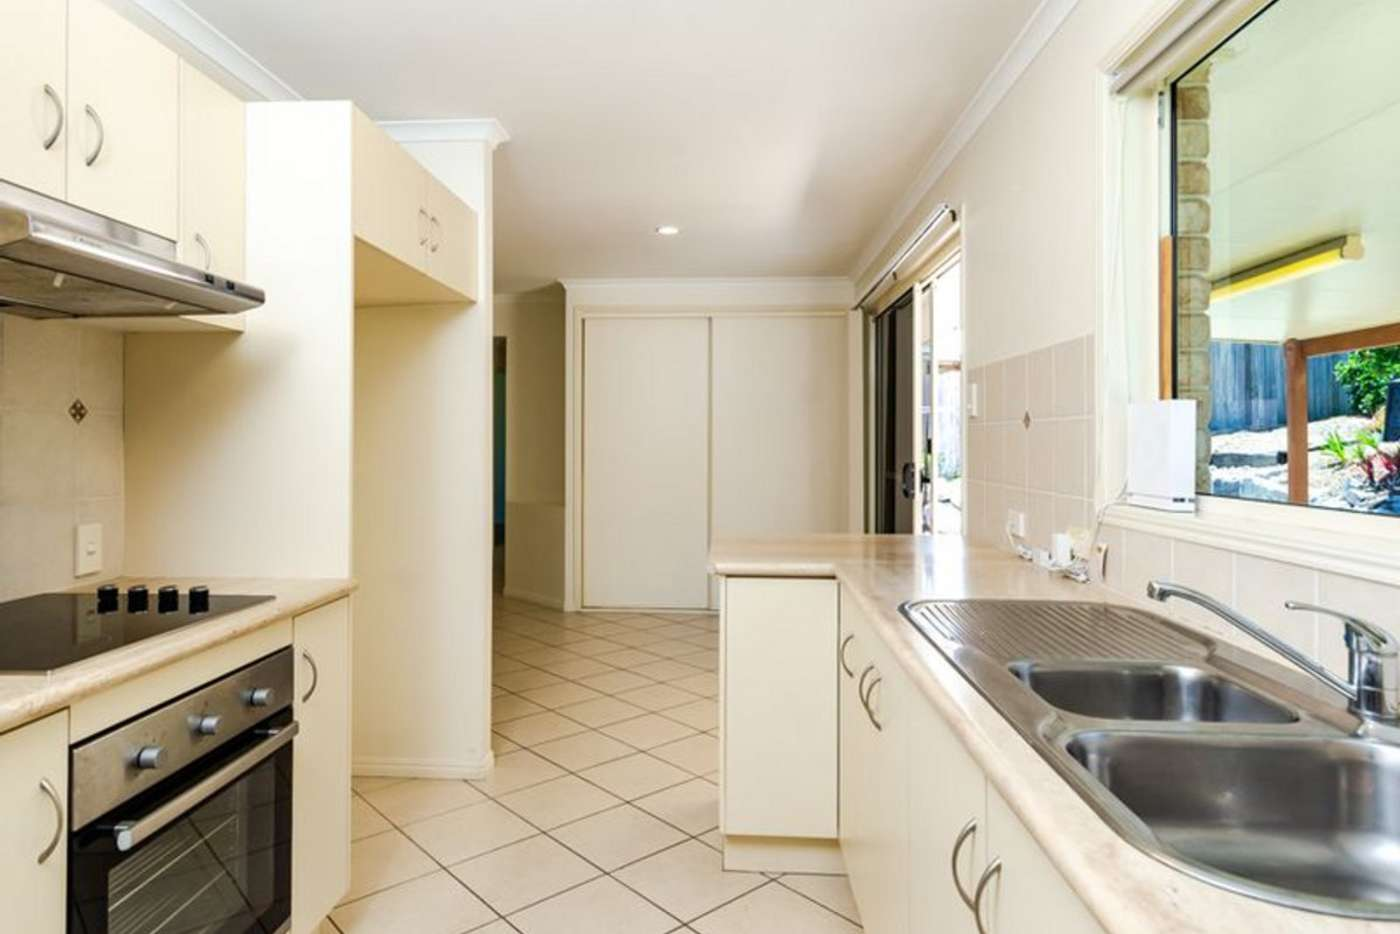 Sixth view of Homely house listing, 28 Beltana Drive, Boyne Island QLD 4680